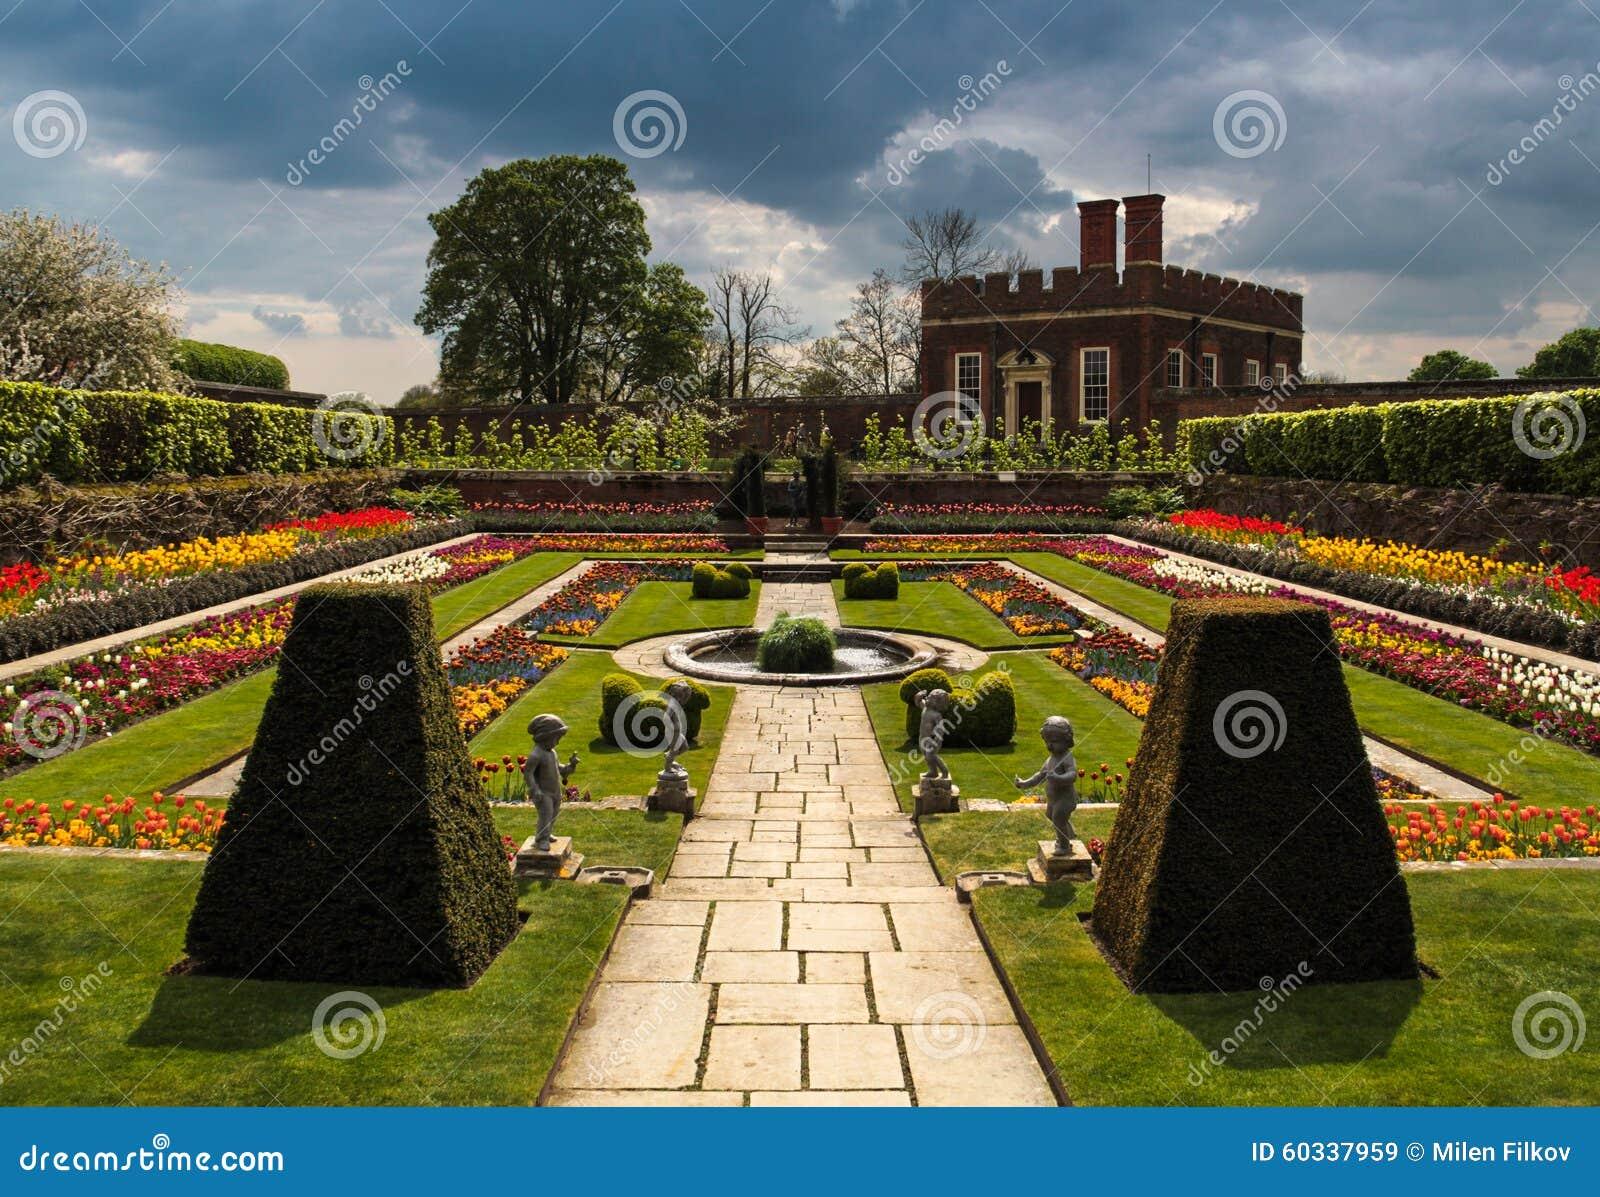 Hampton Court Palace Garden Surrey England Stock Image - Image of ...